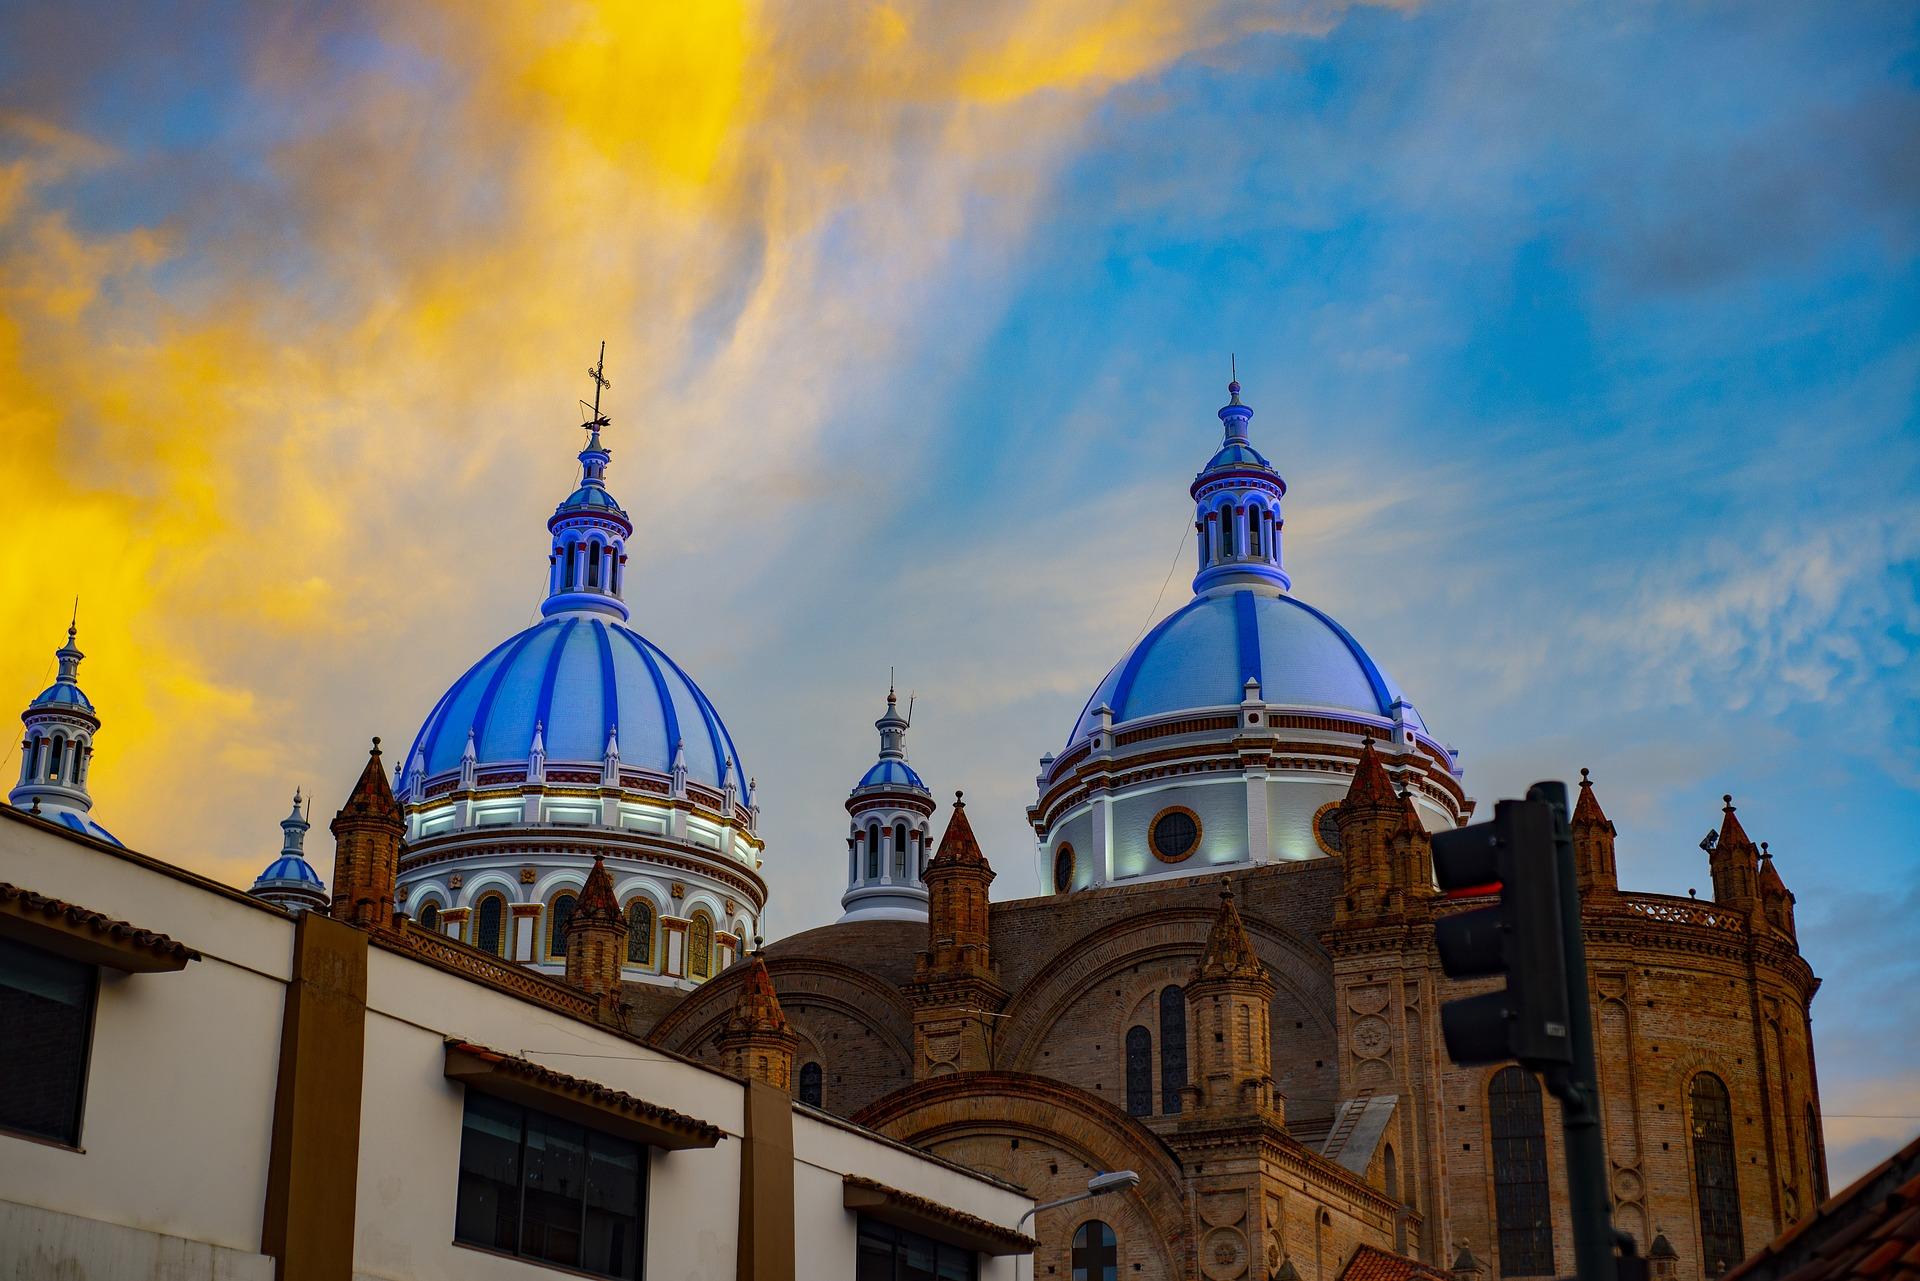 Pathways Through The Andes | Cathedral of Cuenca, Ecuador